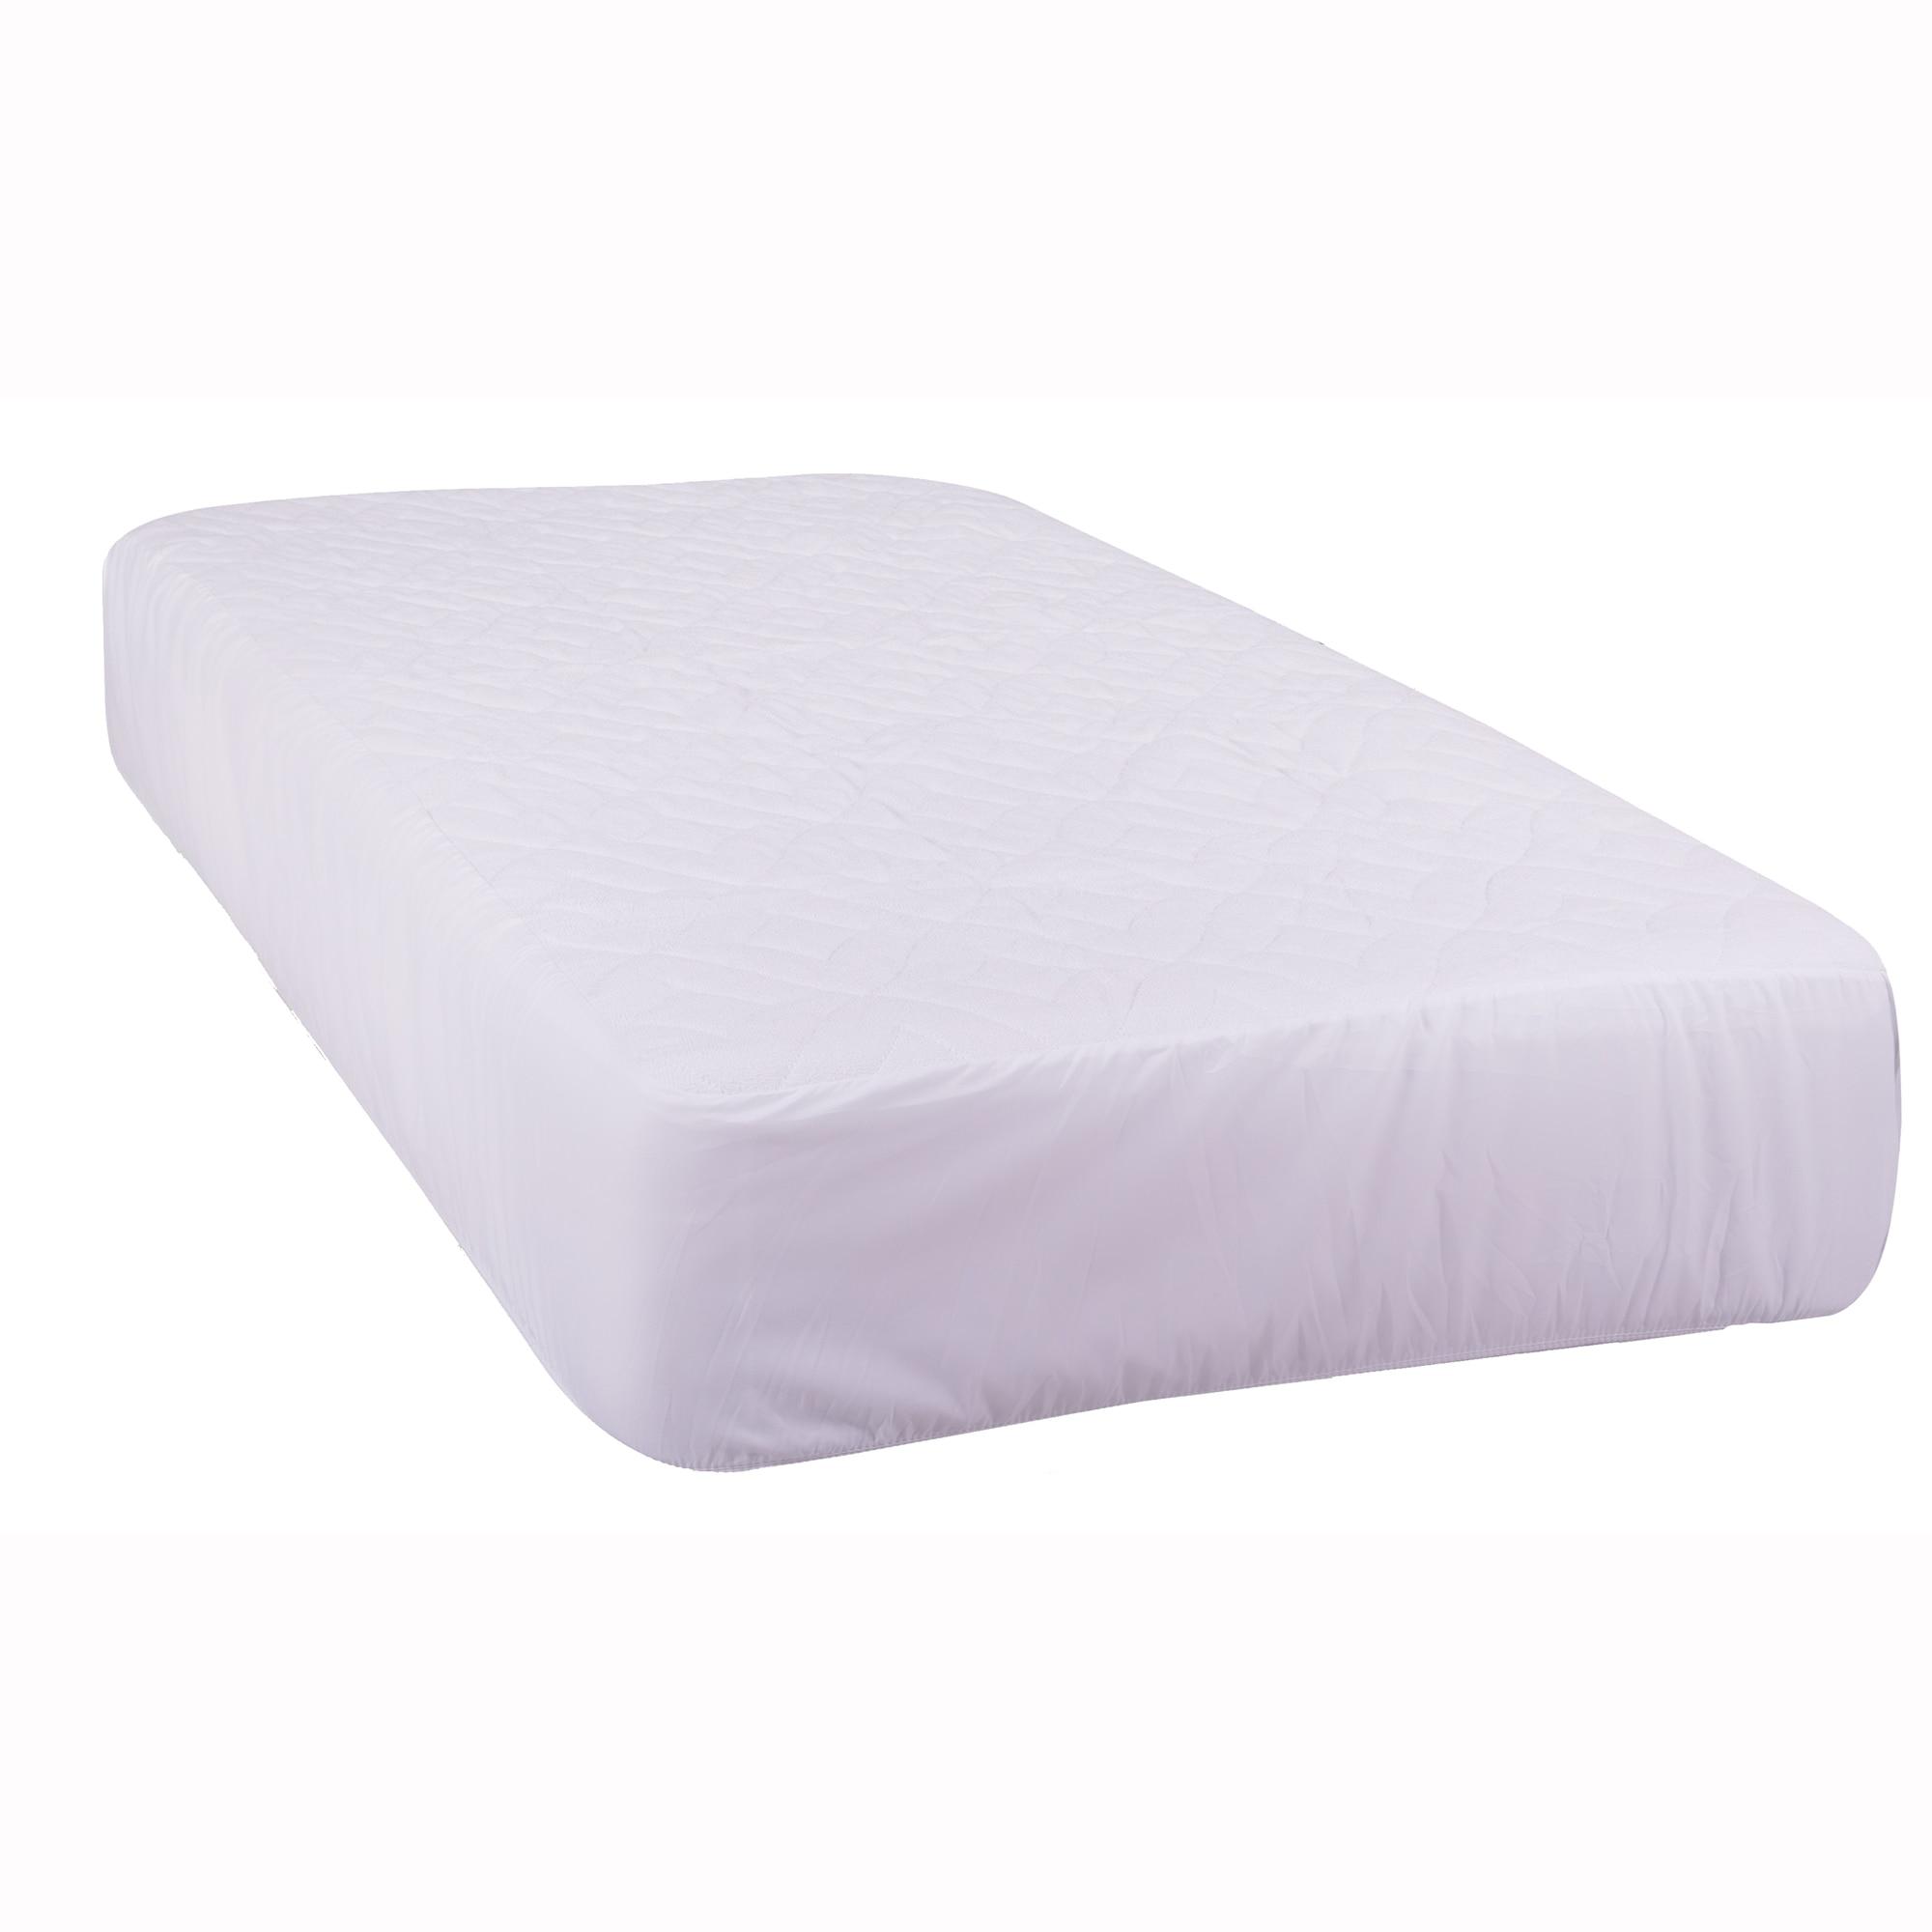 Fotografie Protectie saltea matlasata cu elastic Kring Zafir Rizo, impermeabila, 100% bumbac, cu baza PVC, cu umplutura de poliester 100 gr, 180x200 cm